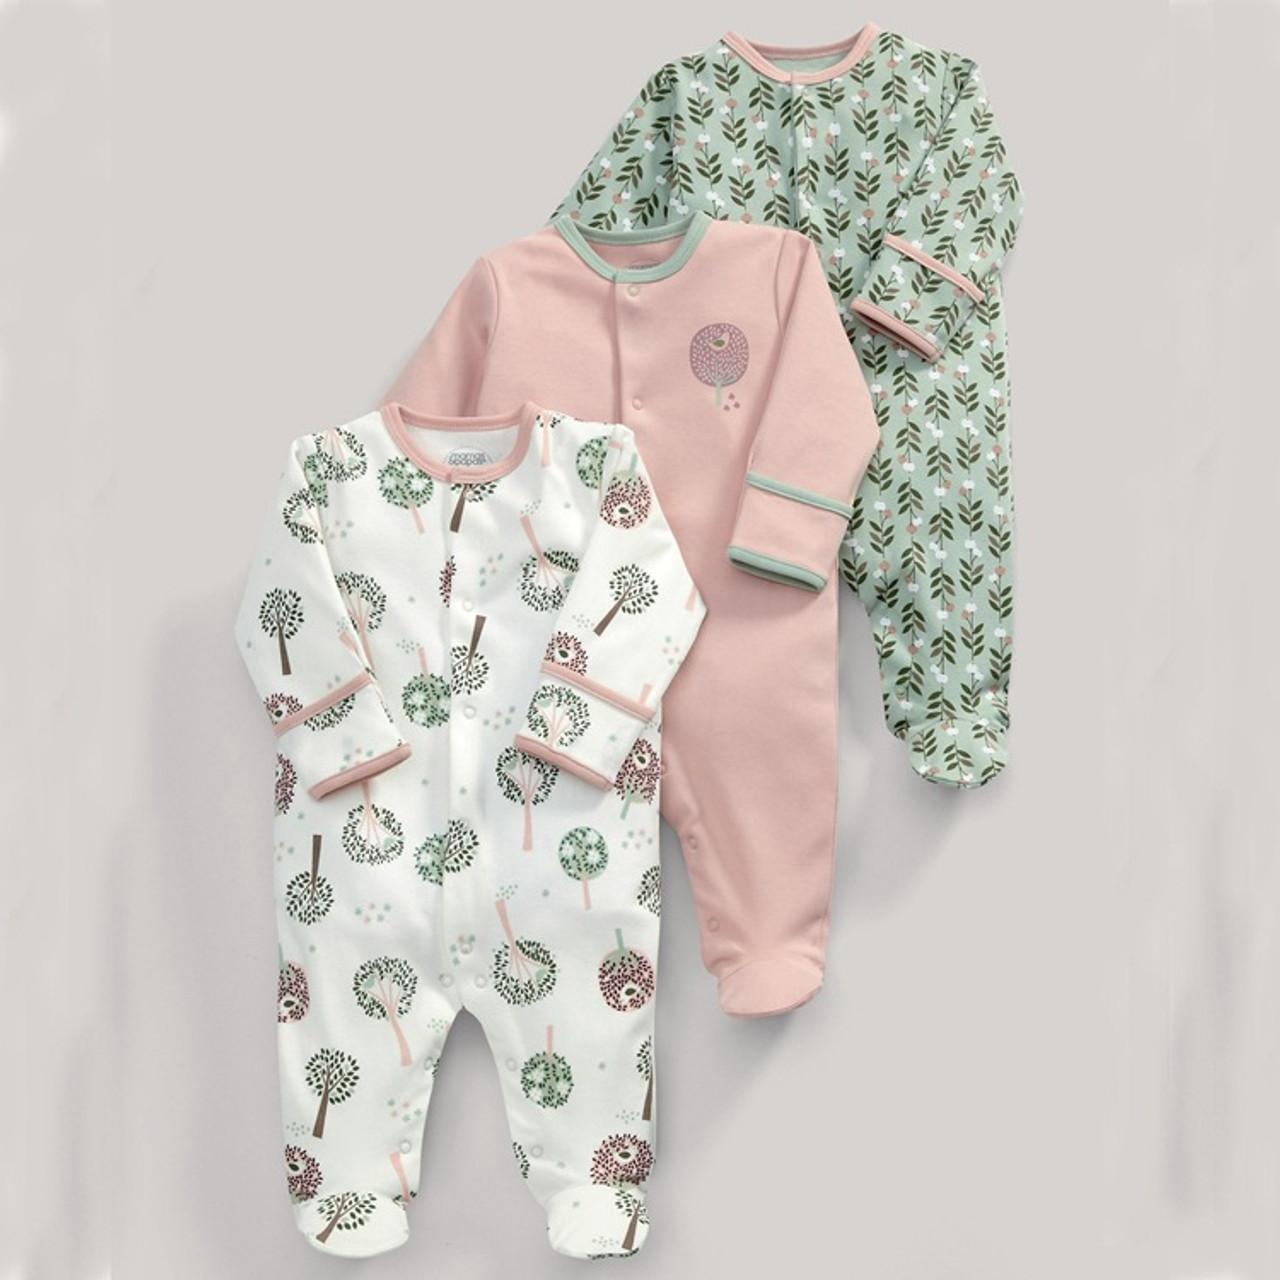 1b4b9c2bf315 3pcs Newborn Baby Girl Clothes Cotton Baby Rompers Children s Fashion  vetement enfant fille Kid Winter Jumpsuit ...